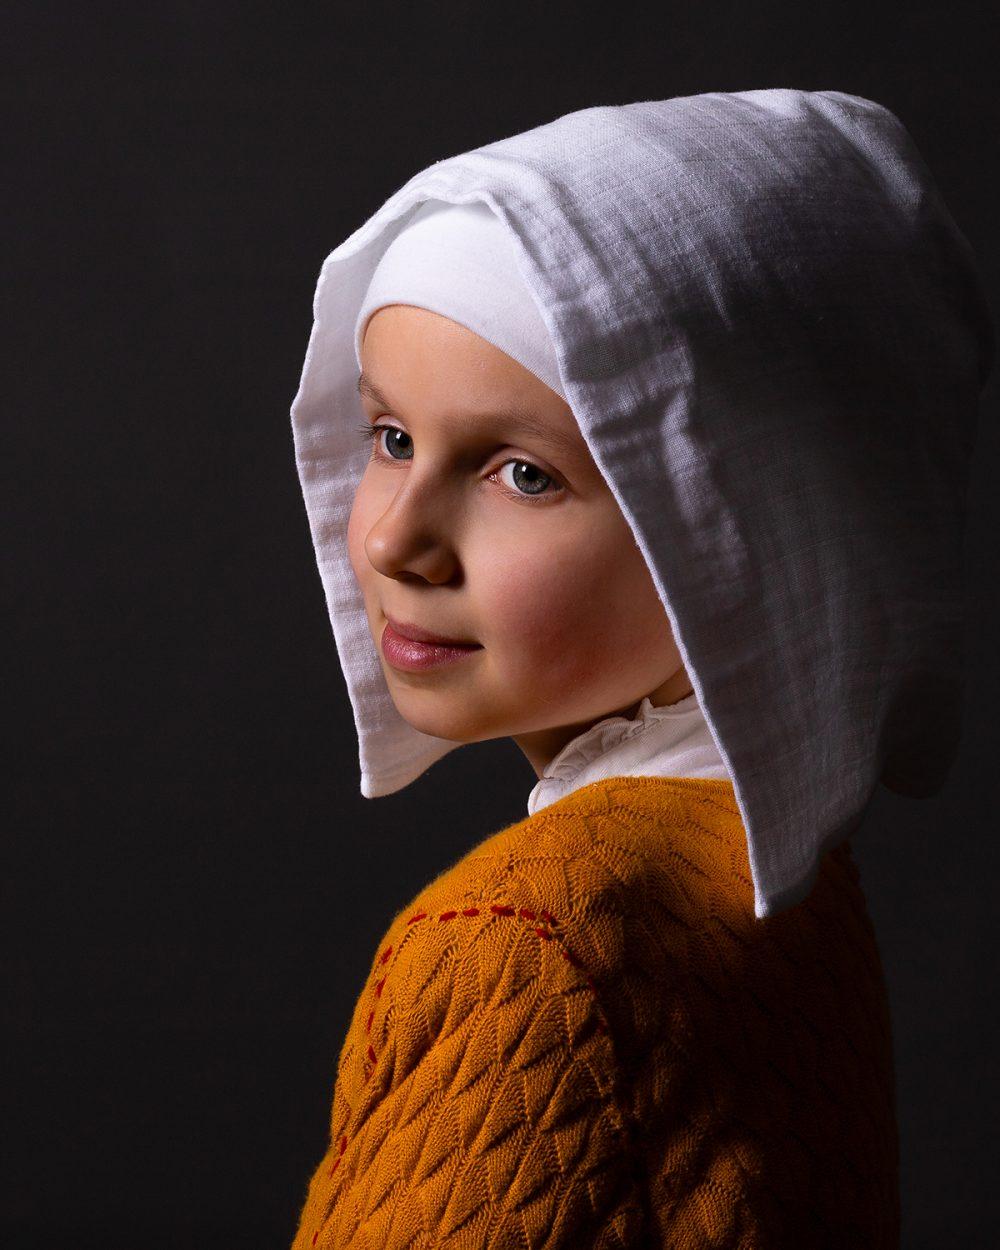 kinder-portret-melkmeisje-vermeer